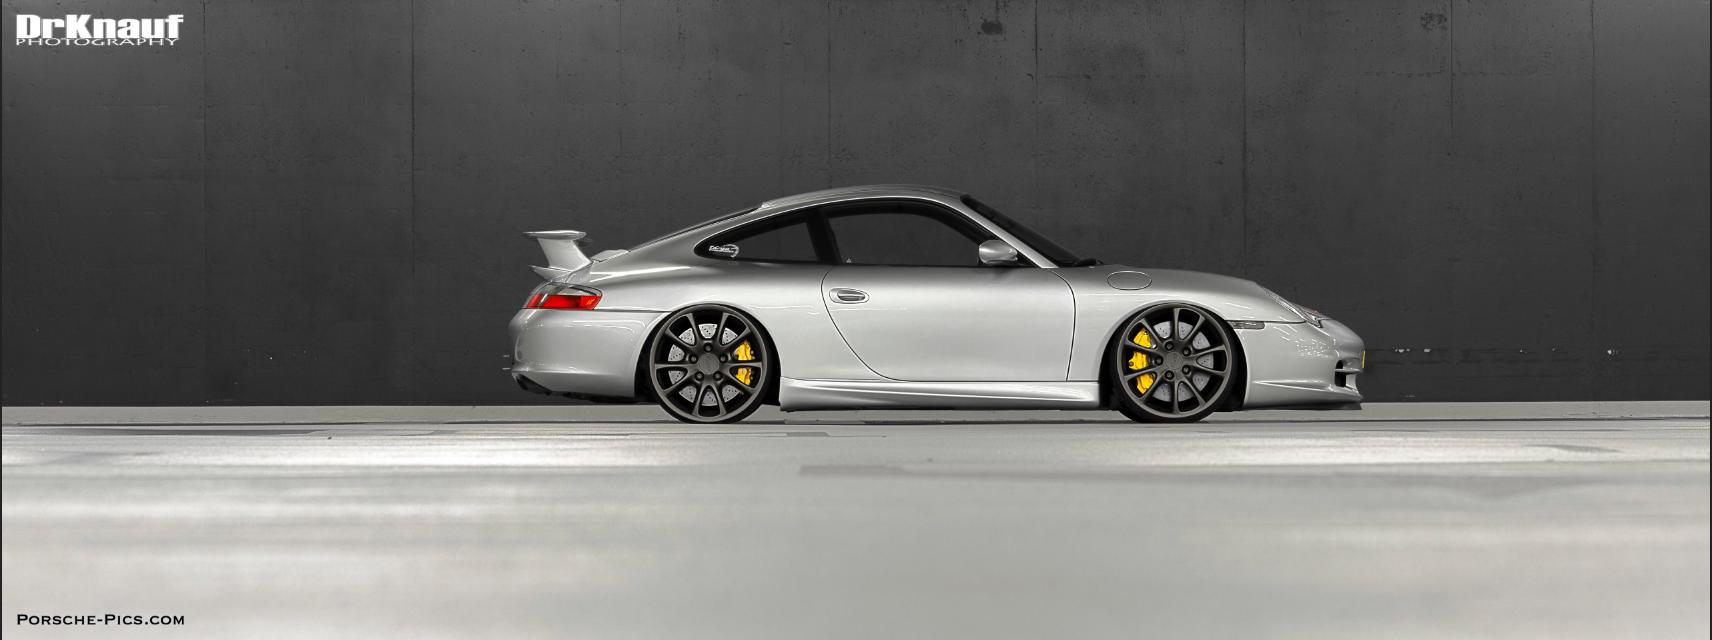 Mike paradis porsche - Page 22 Dr-Knauf-Slammed-Altered-Steefs-Porsche-GT3-2019